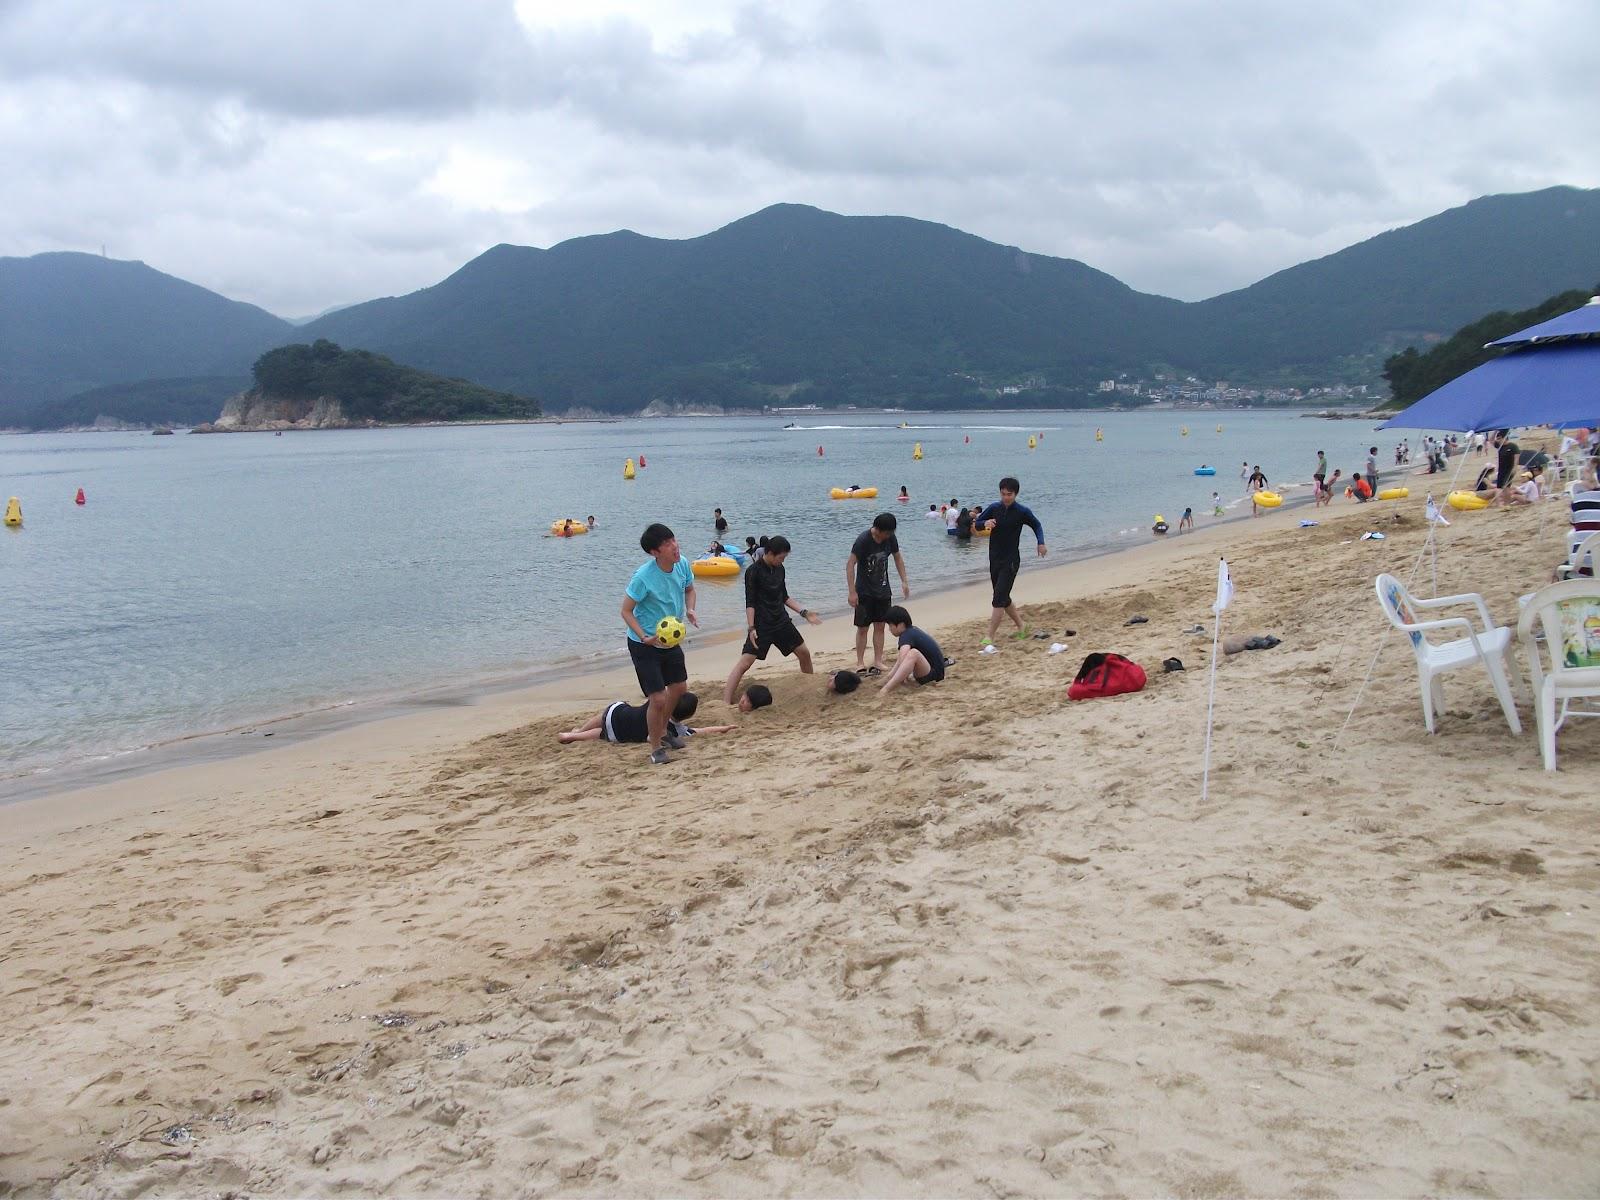 Geoje-si South Korea  city images : Gujora Beach, Geoje Si, South Korea | Koreabridge